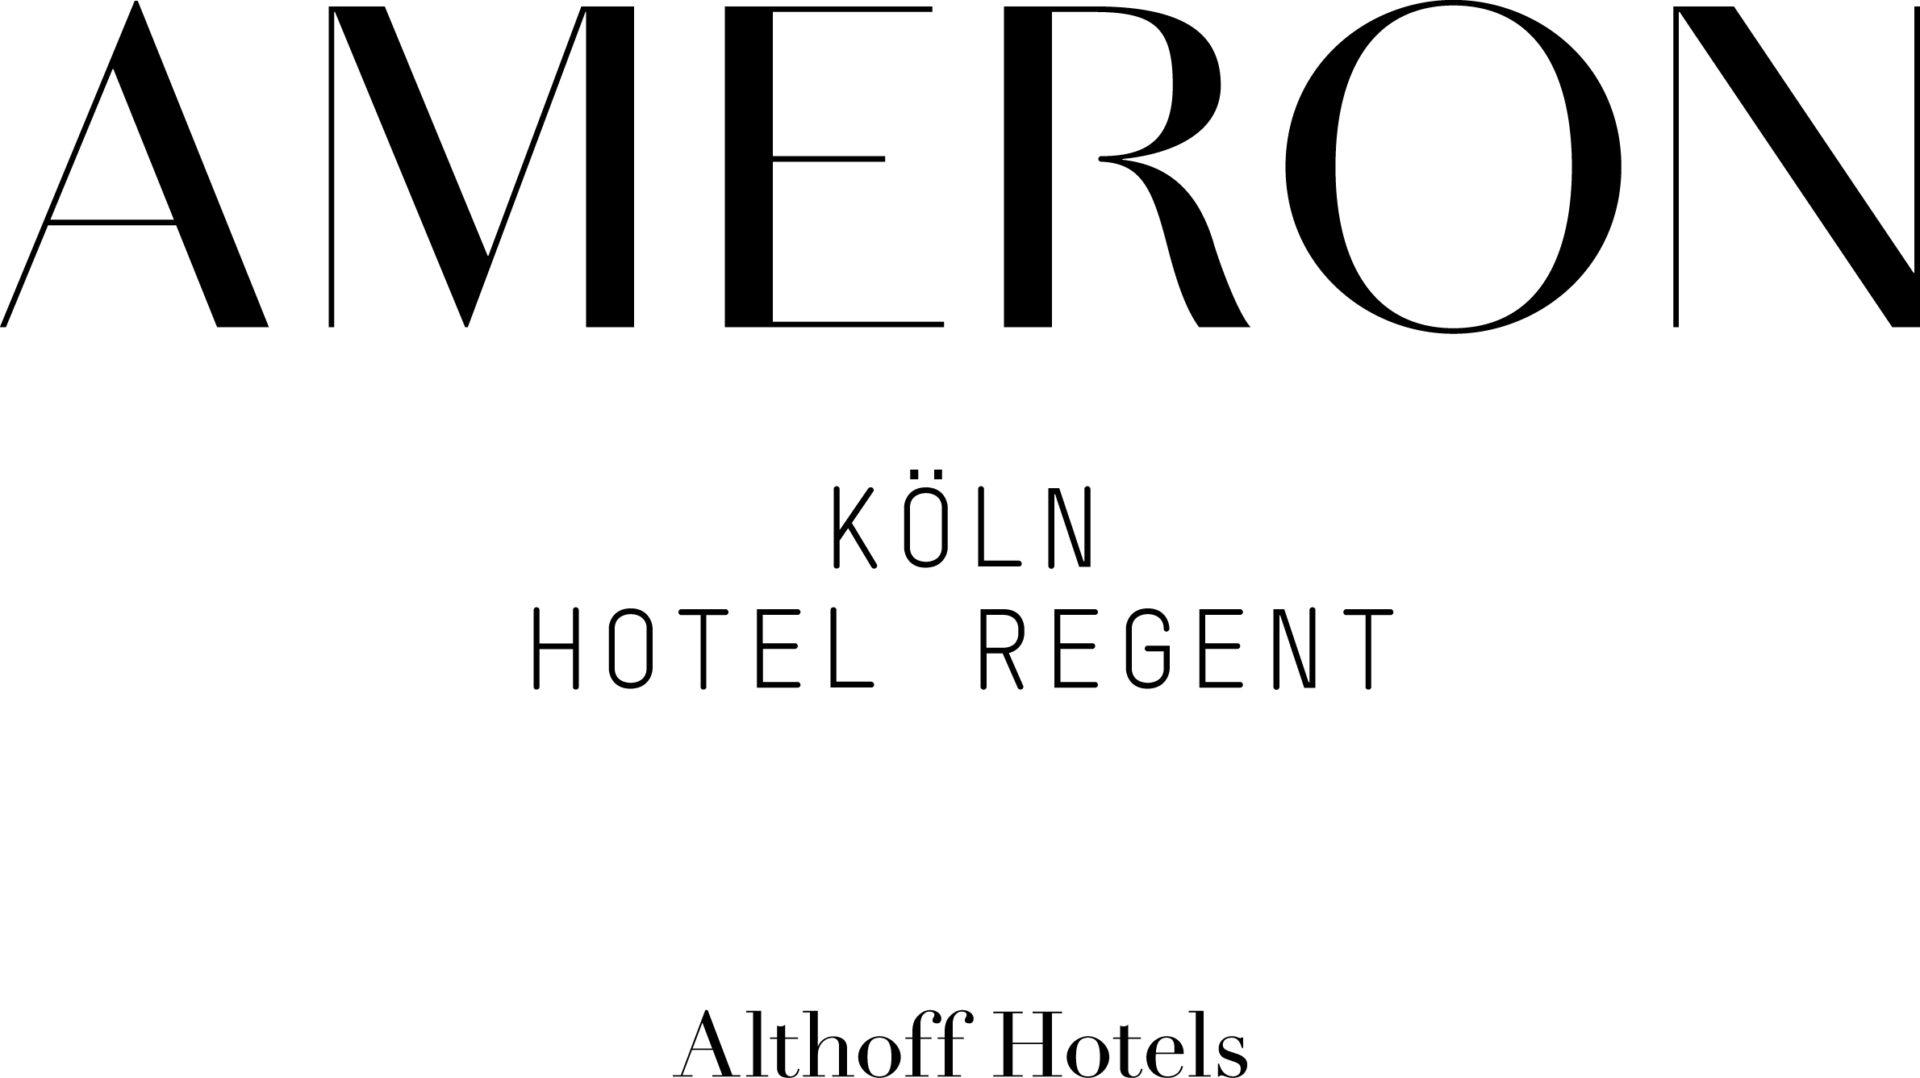 AMERON Köln Hotel Regent